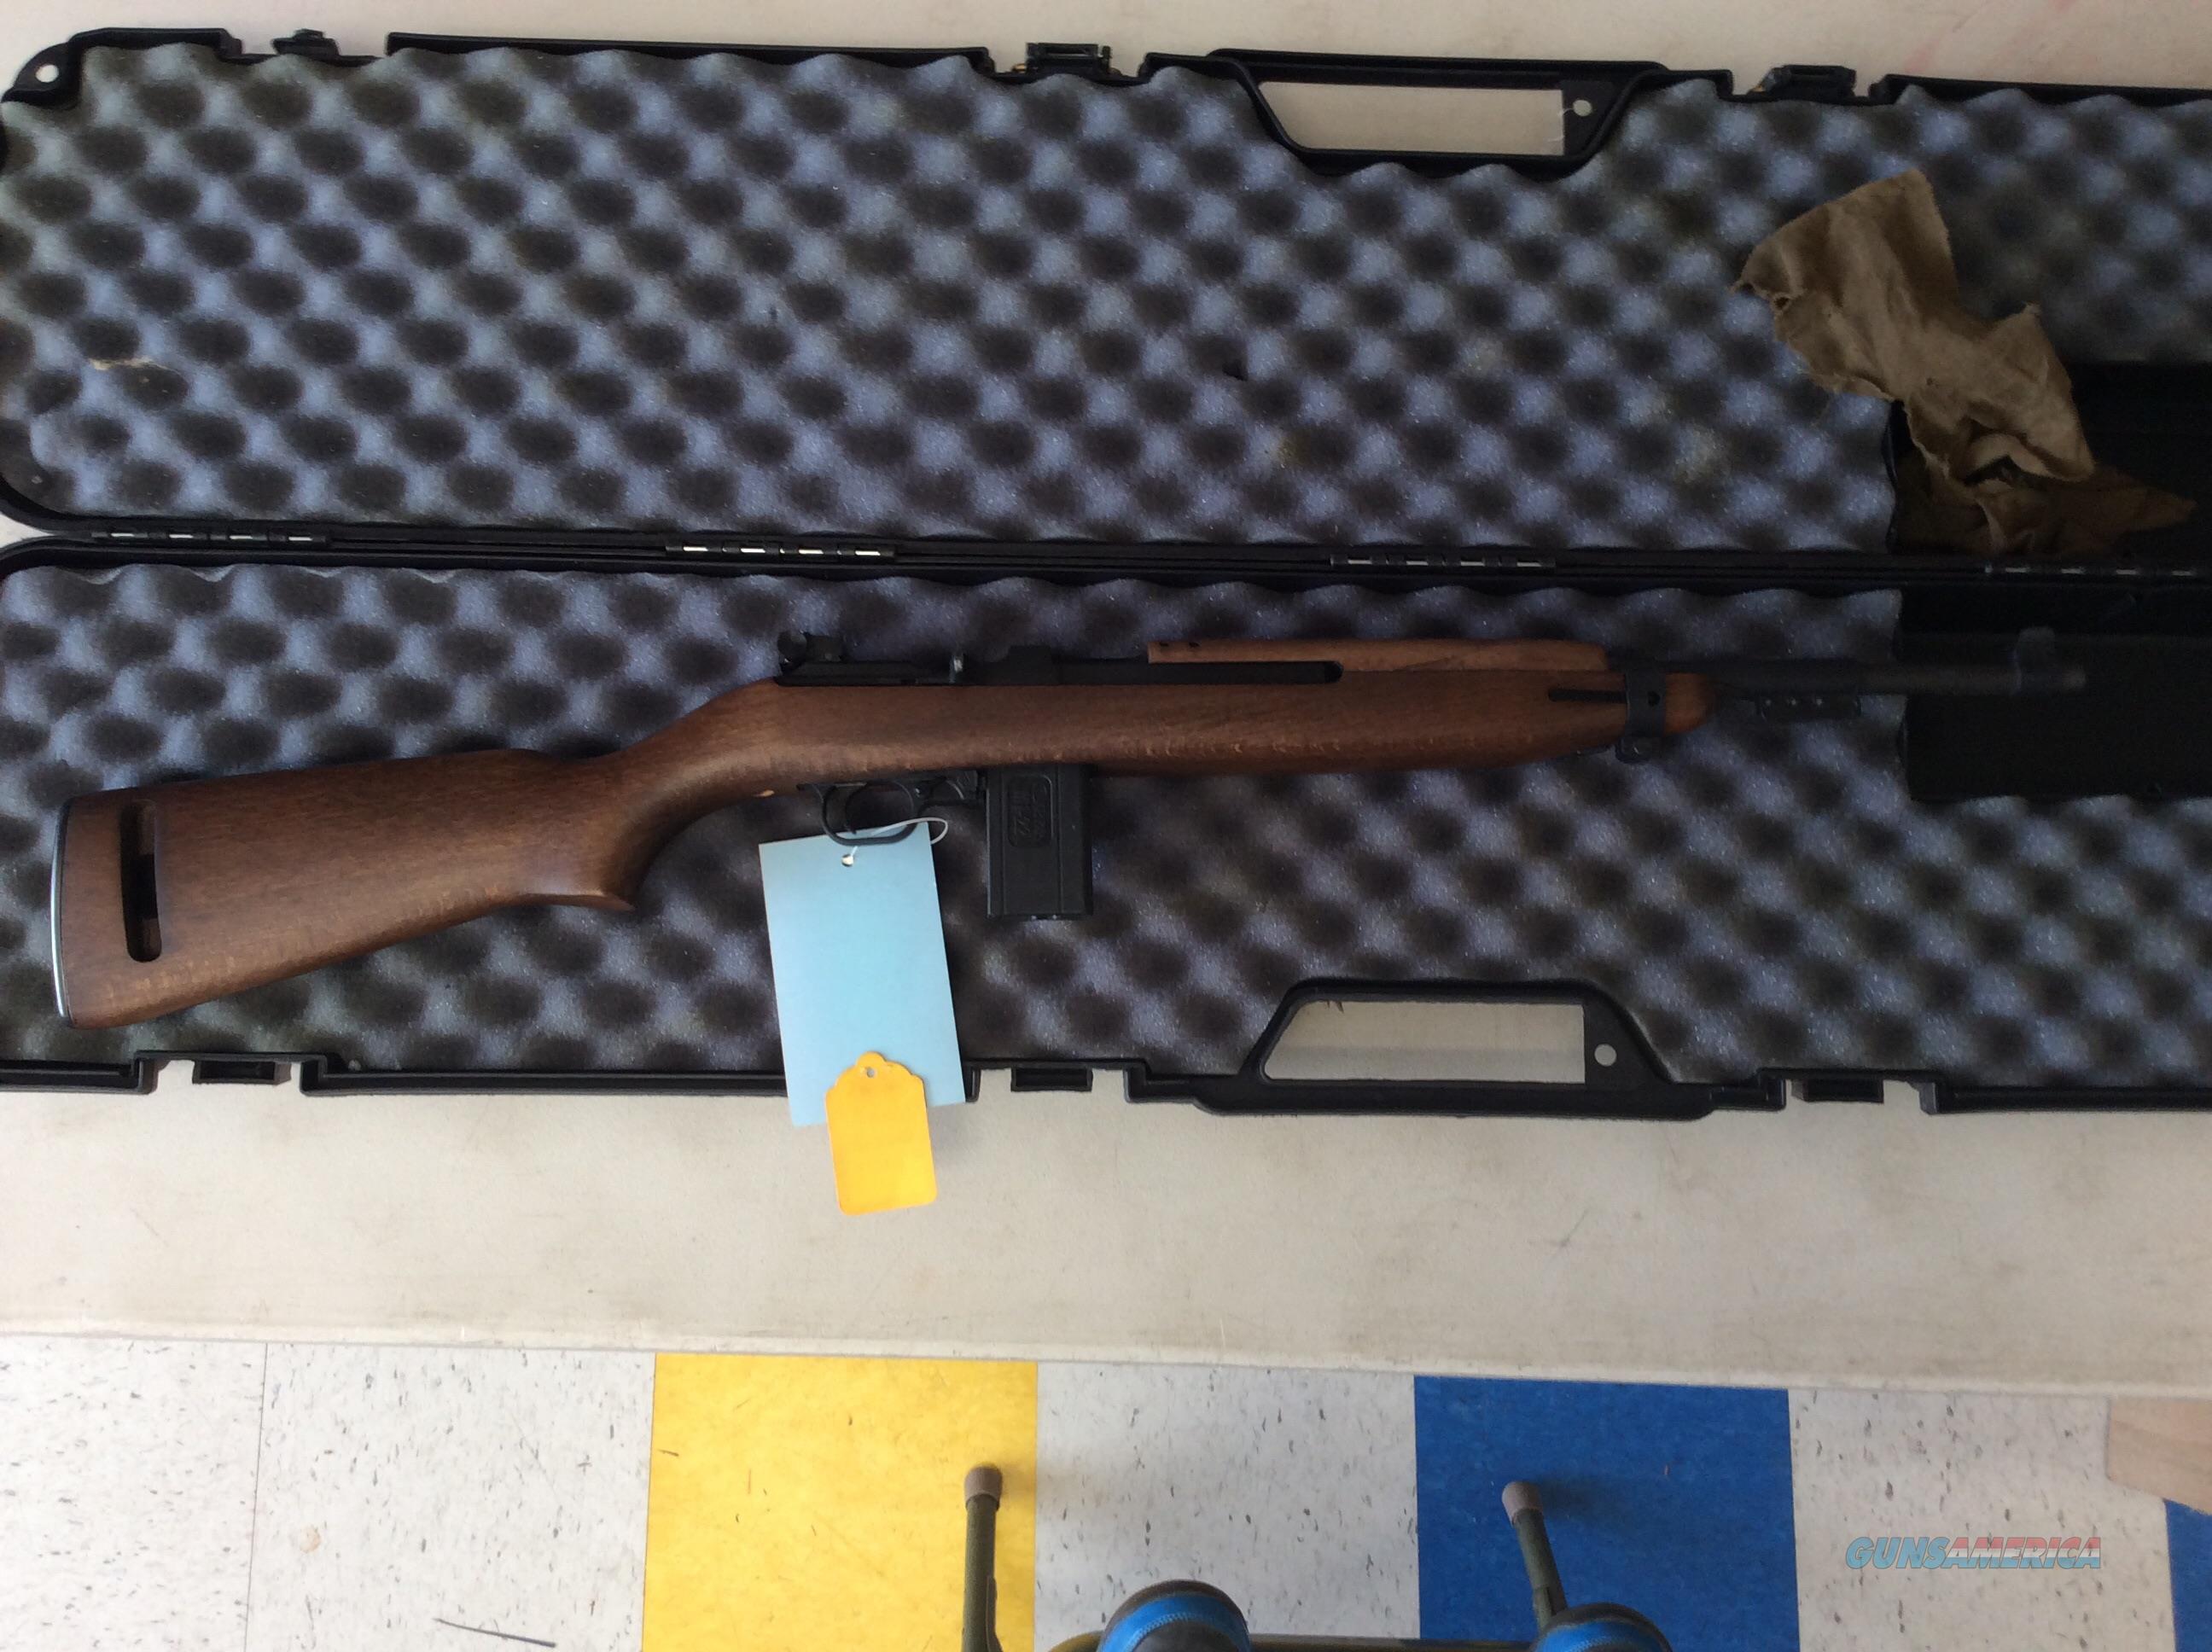 Chiappa  M1-22 22LR carbine  Guns > Rifles > Chiappa / Armi Sport Rifles > .22 Cal Rifles